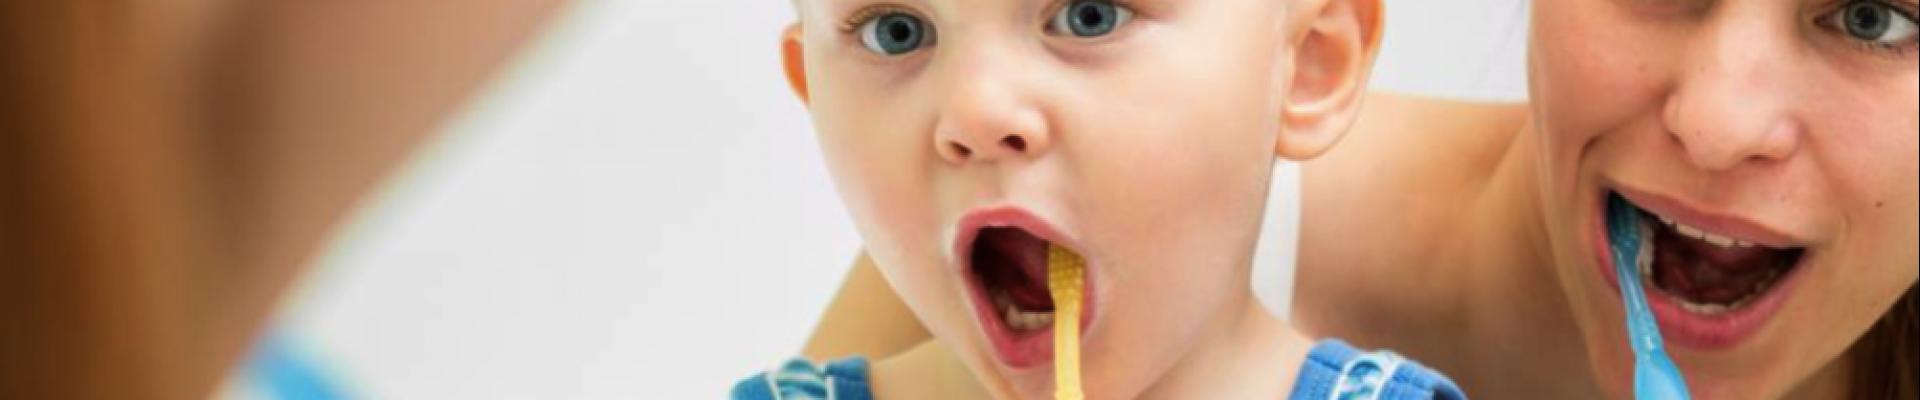 cepillame cepillate como prevenir las caries clinica dental achutegui dentista amara donostia san sebastian